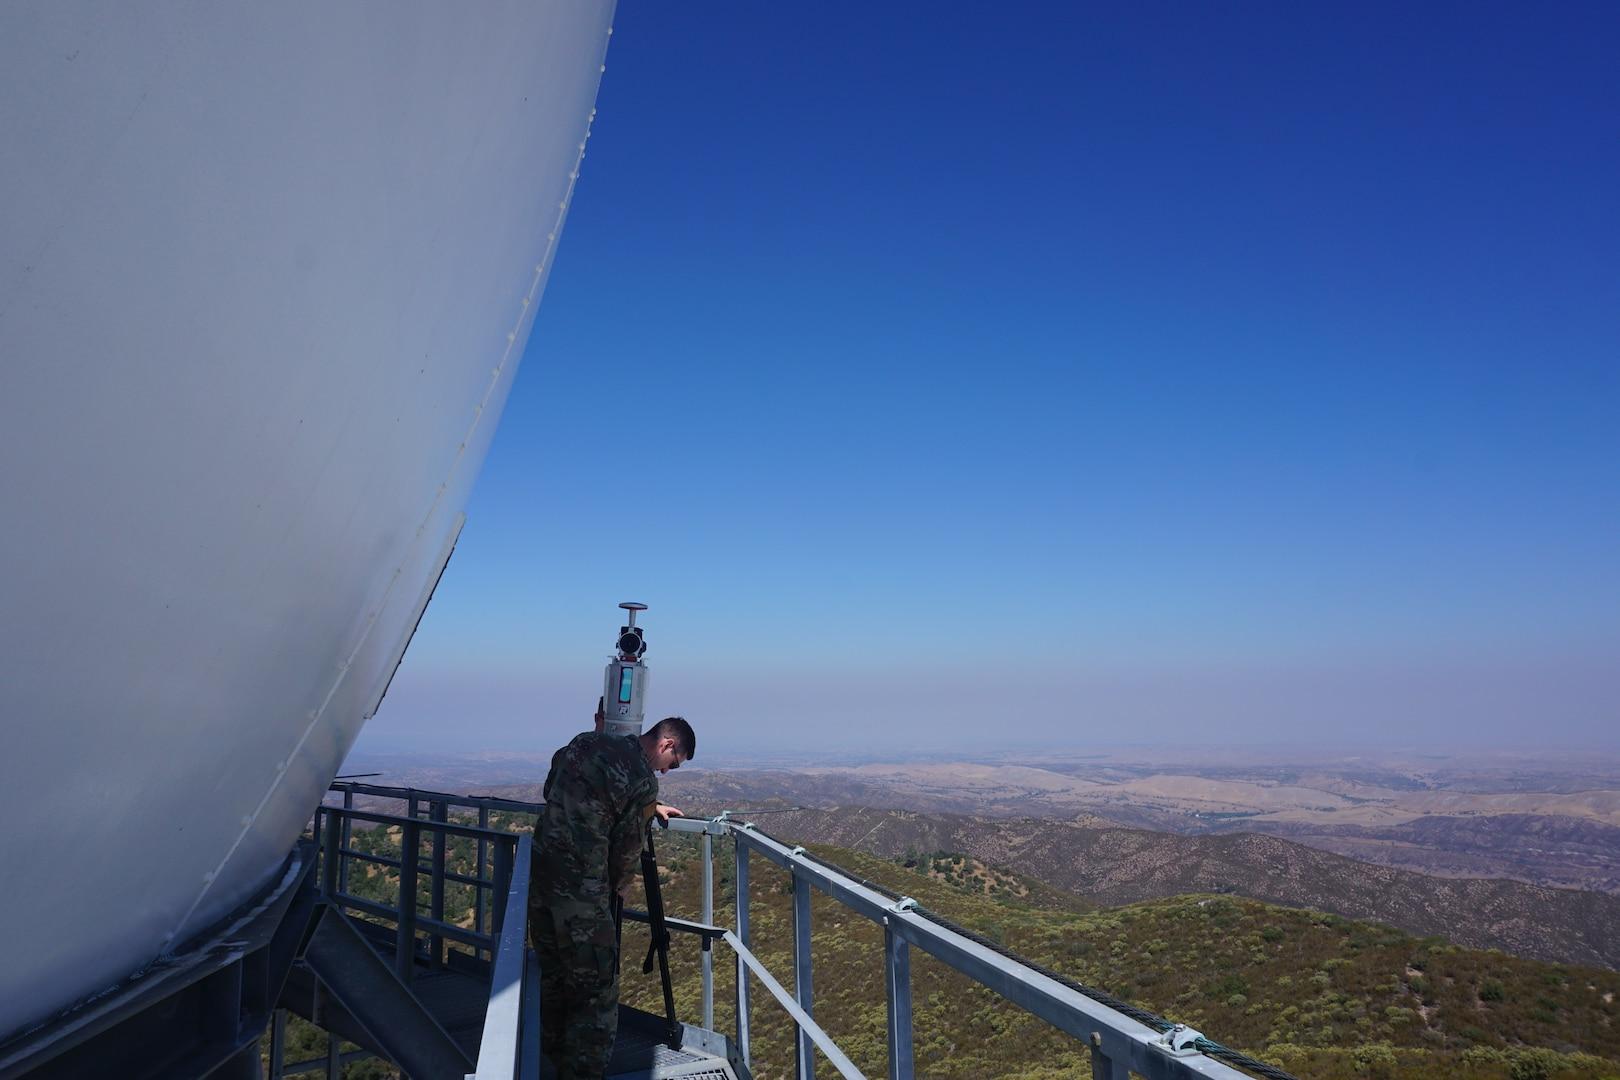 Two U.S. Airmen standing on railing around radar